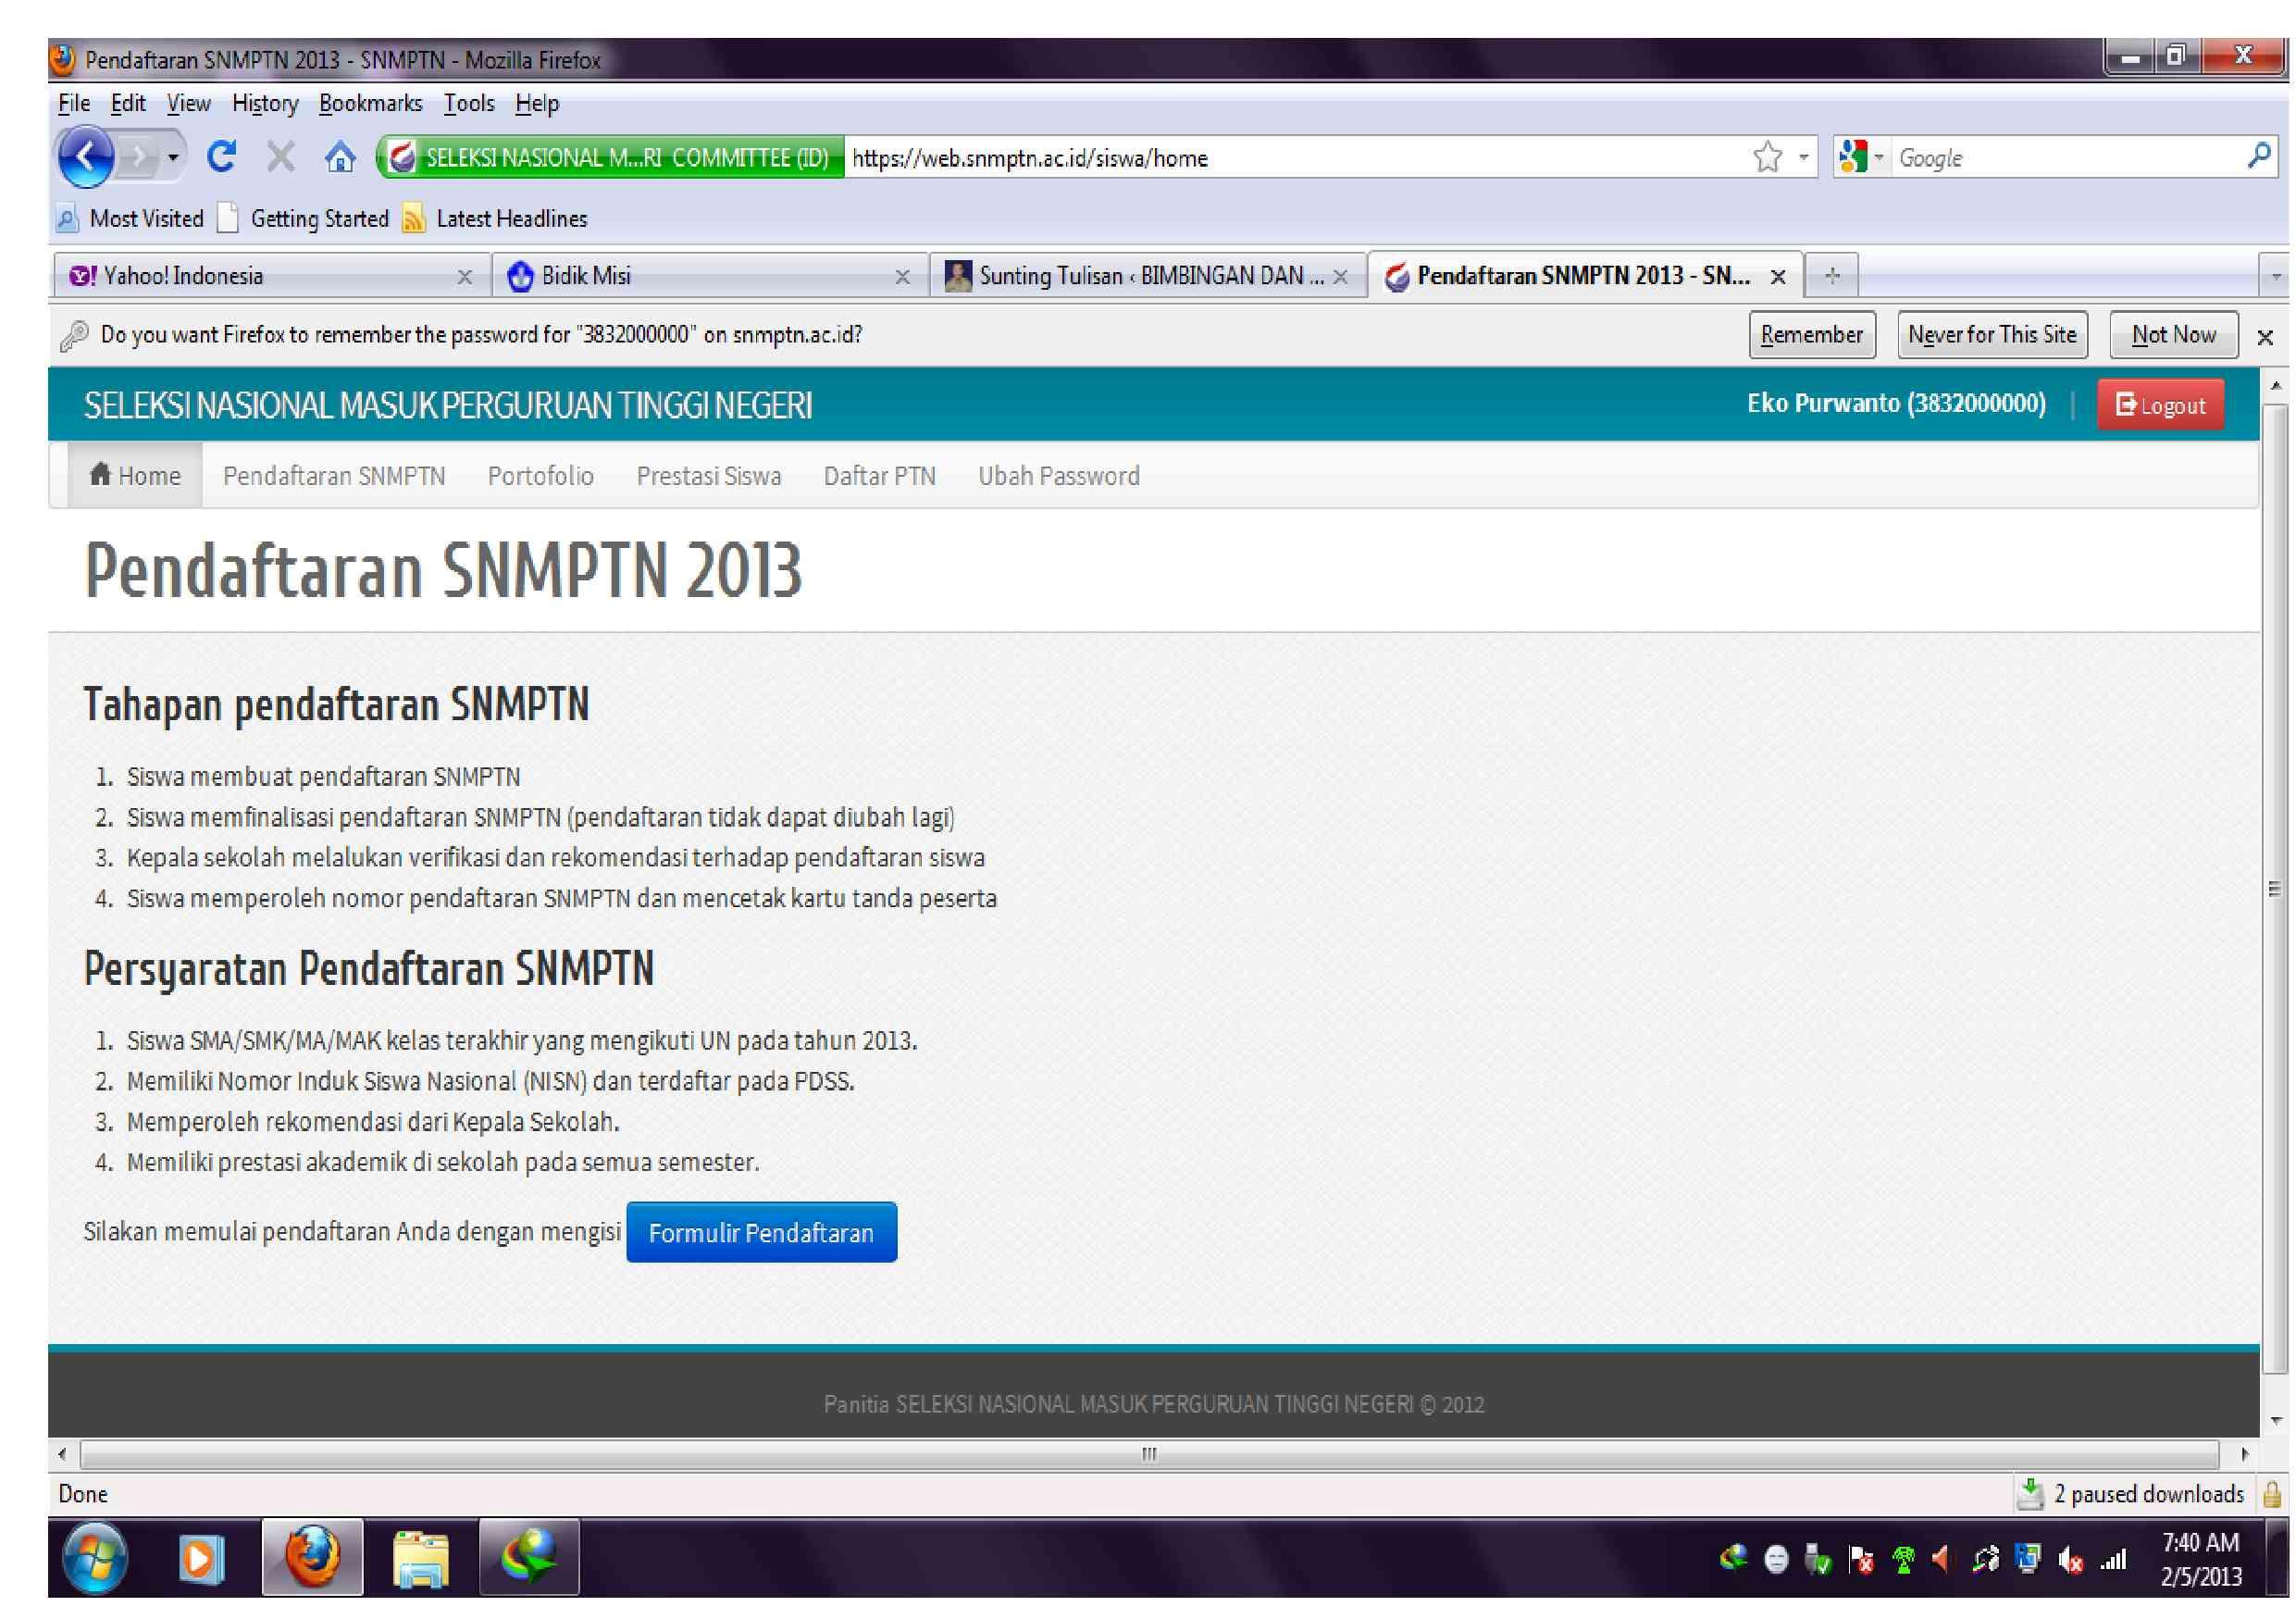 Tata Cara Login Snmptn 2013 Panduan Untuk Siswa Bimbingan Dan